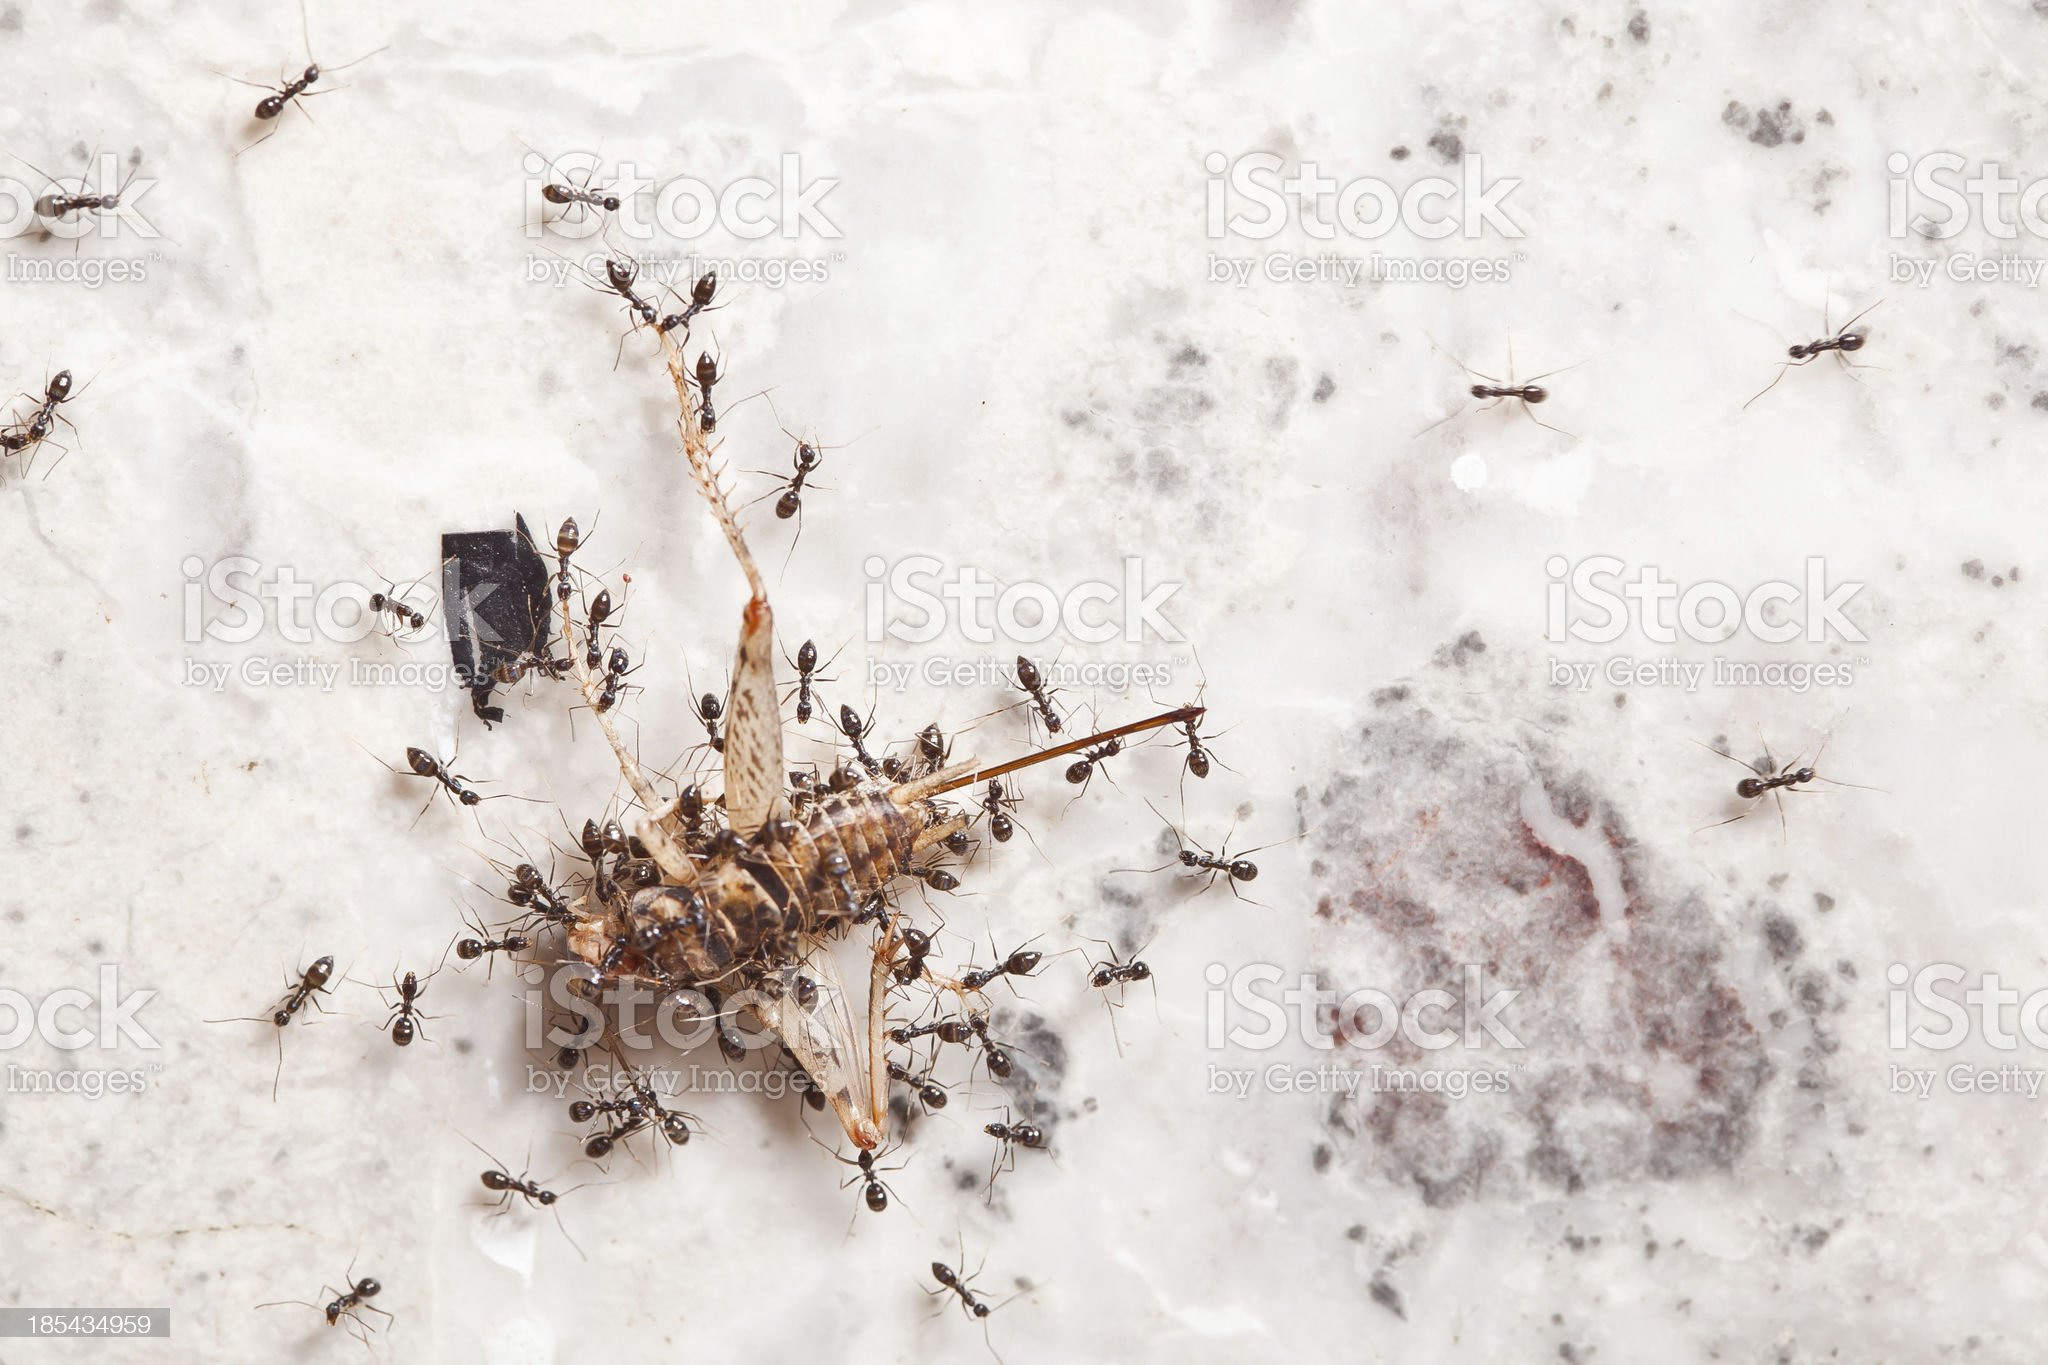 Teamwork of Ants royalty-free stock photo